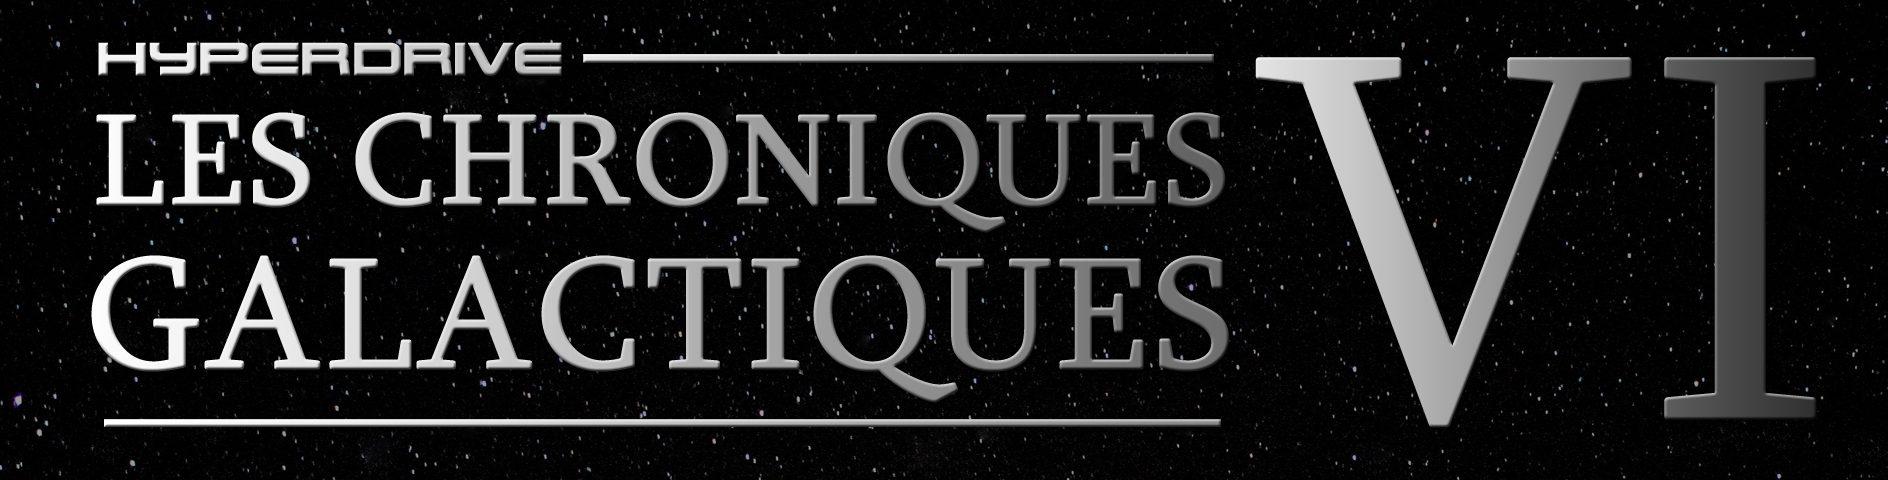 Chroniques galactiques 6 fiction audio Star Wars podcast